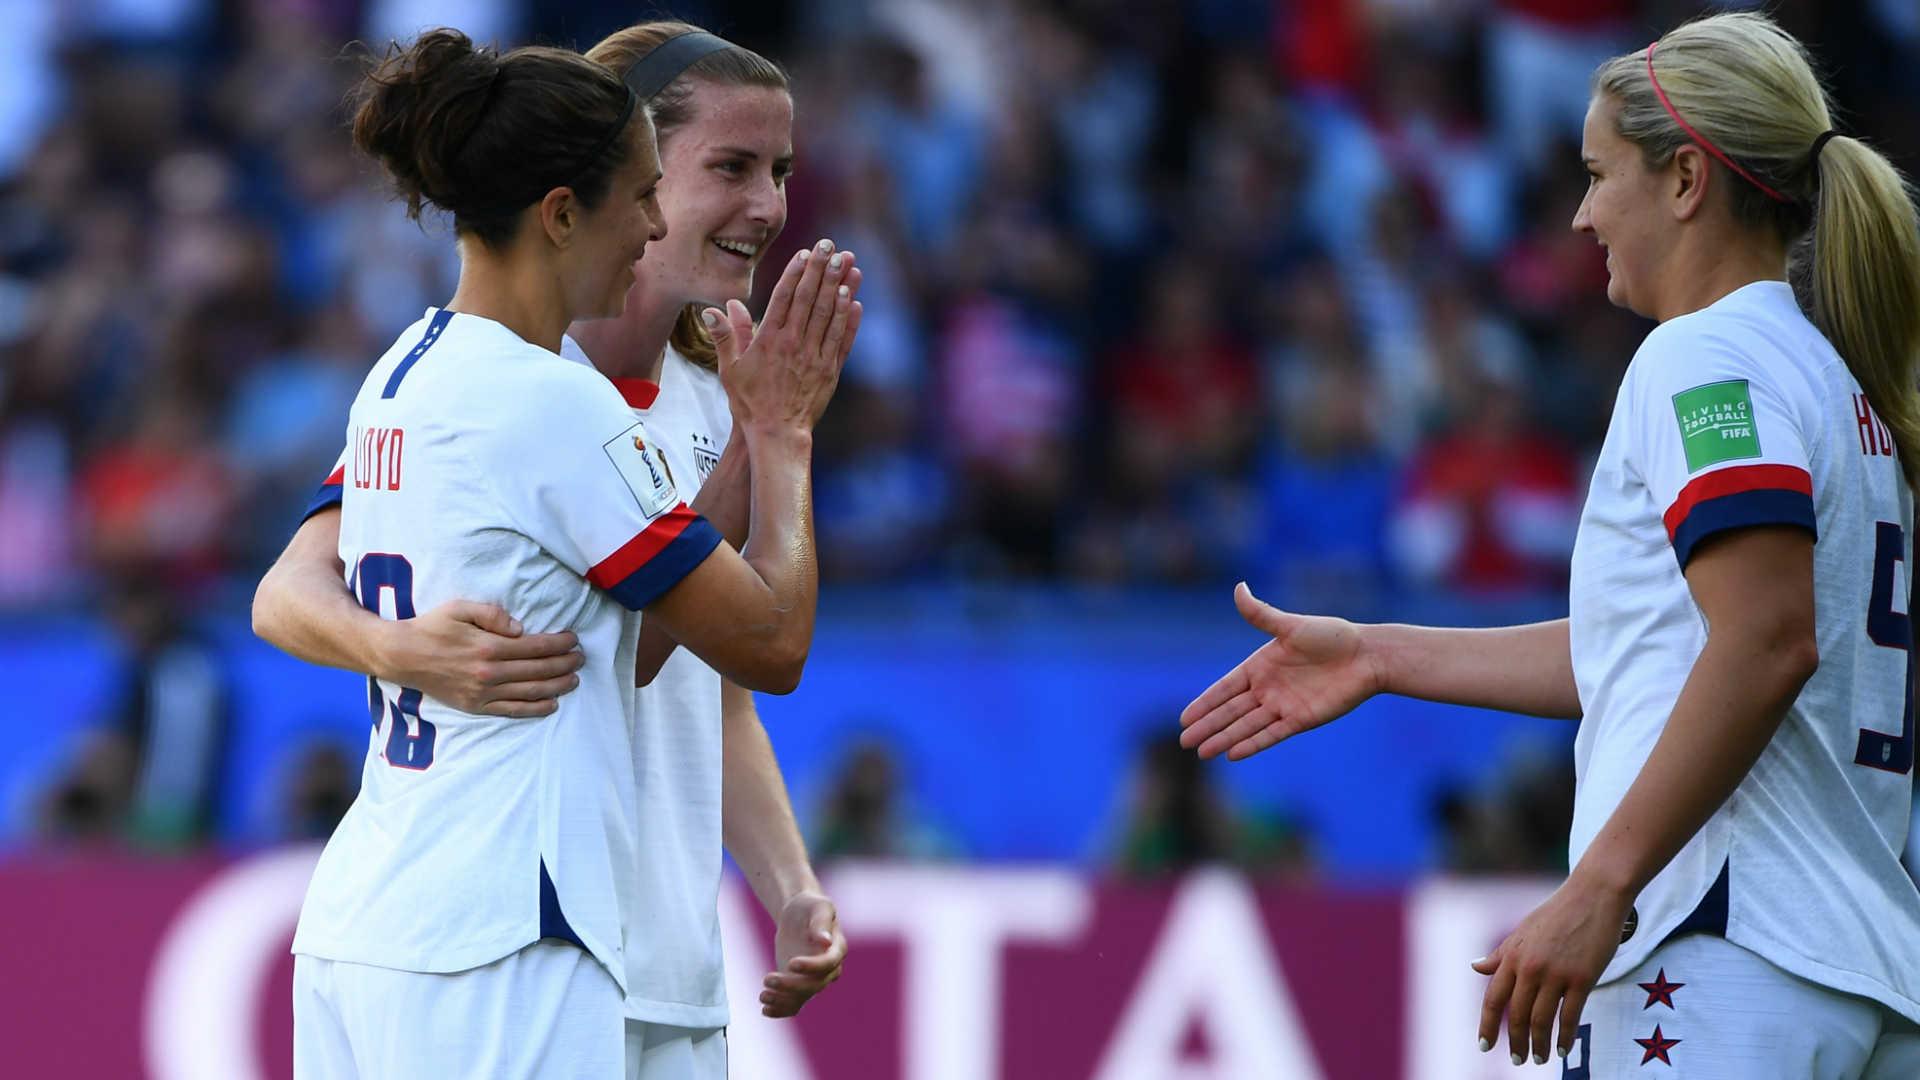 Women's World Cup 2019: Carli Lloyd claps back at critics